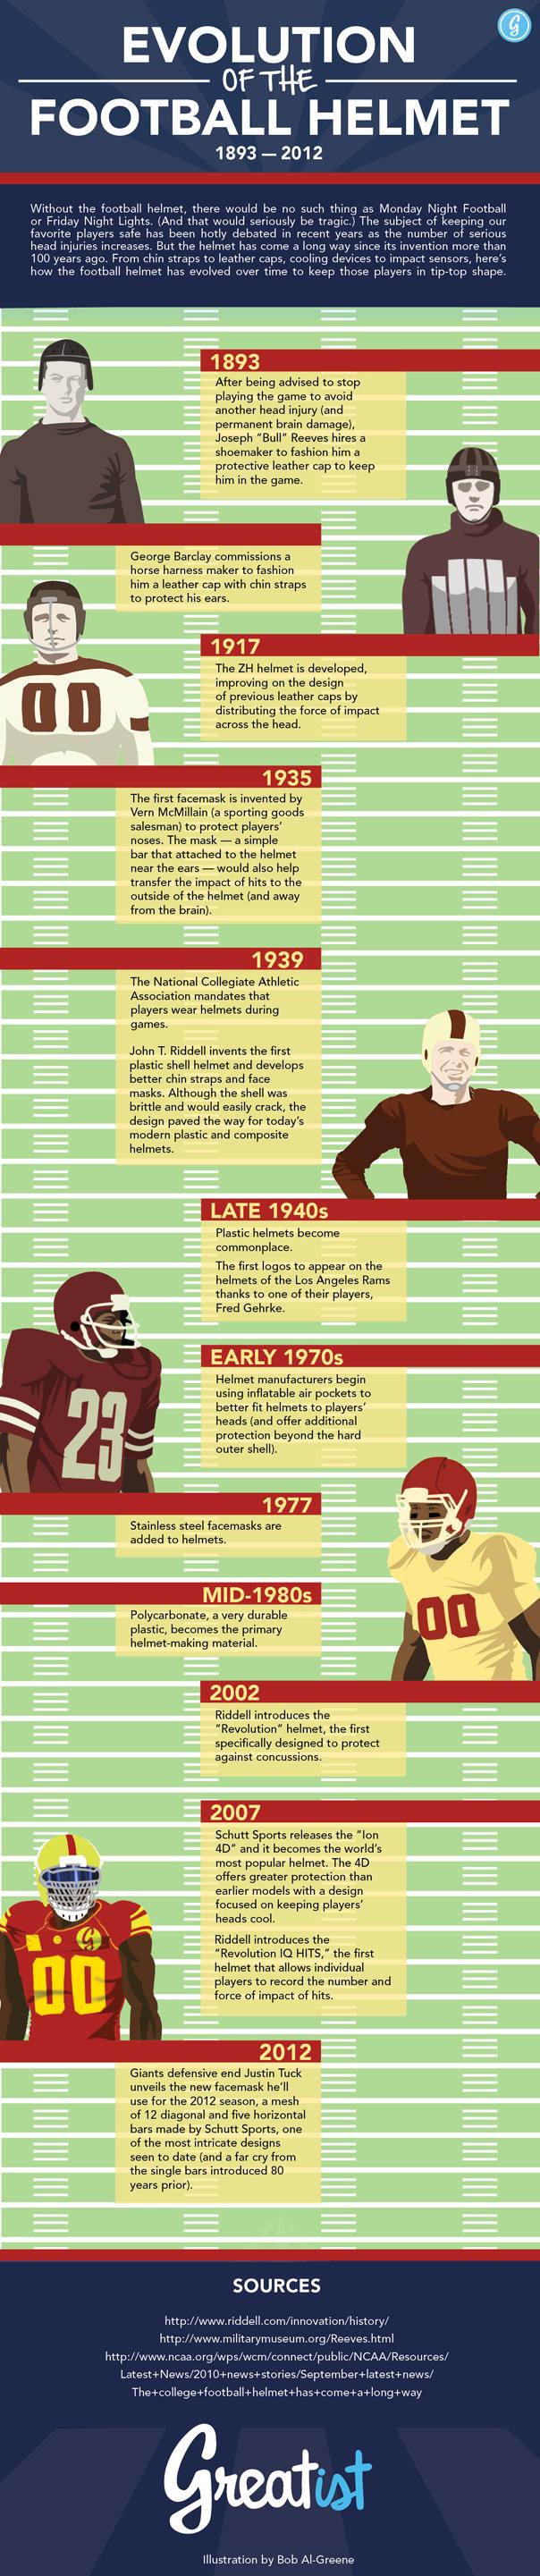 Football Helmet Evolution Infographic